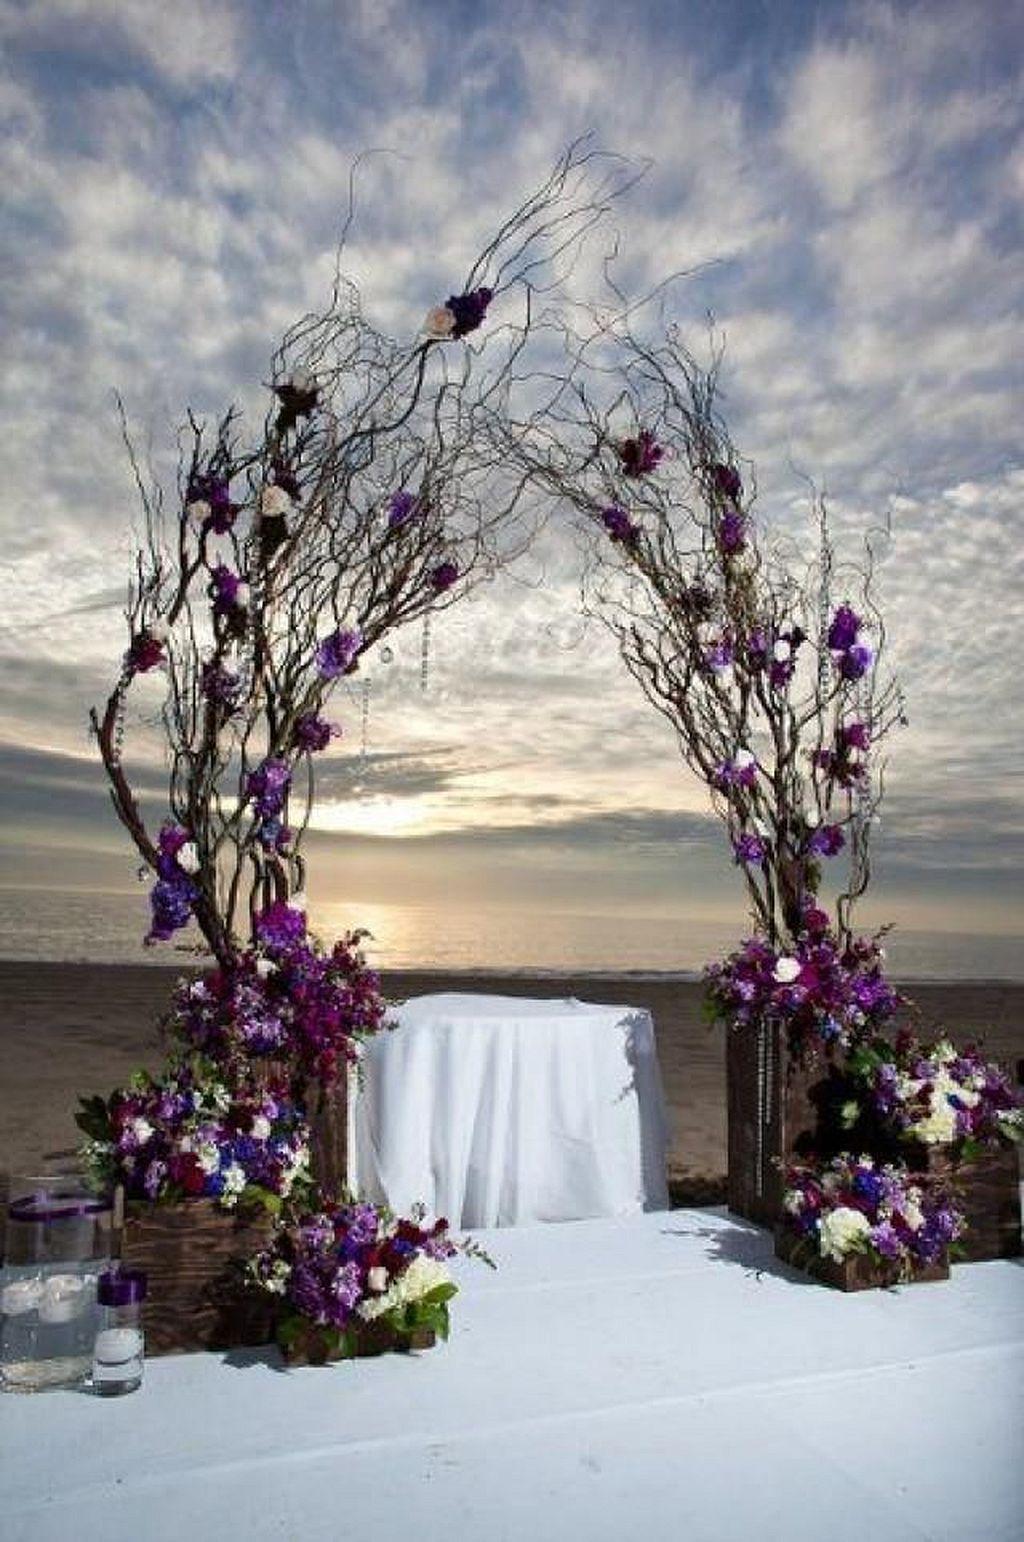 97 floral wedding arch decoration ideas floral wedding flower 97 floral wedding arch decoration ideas junglespirit Choice Image